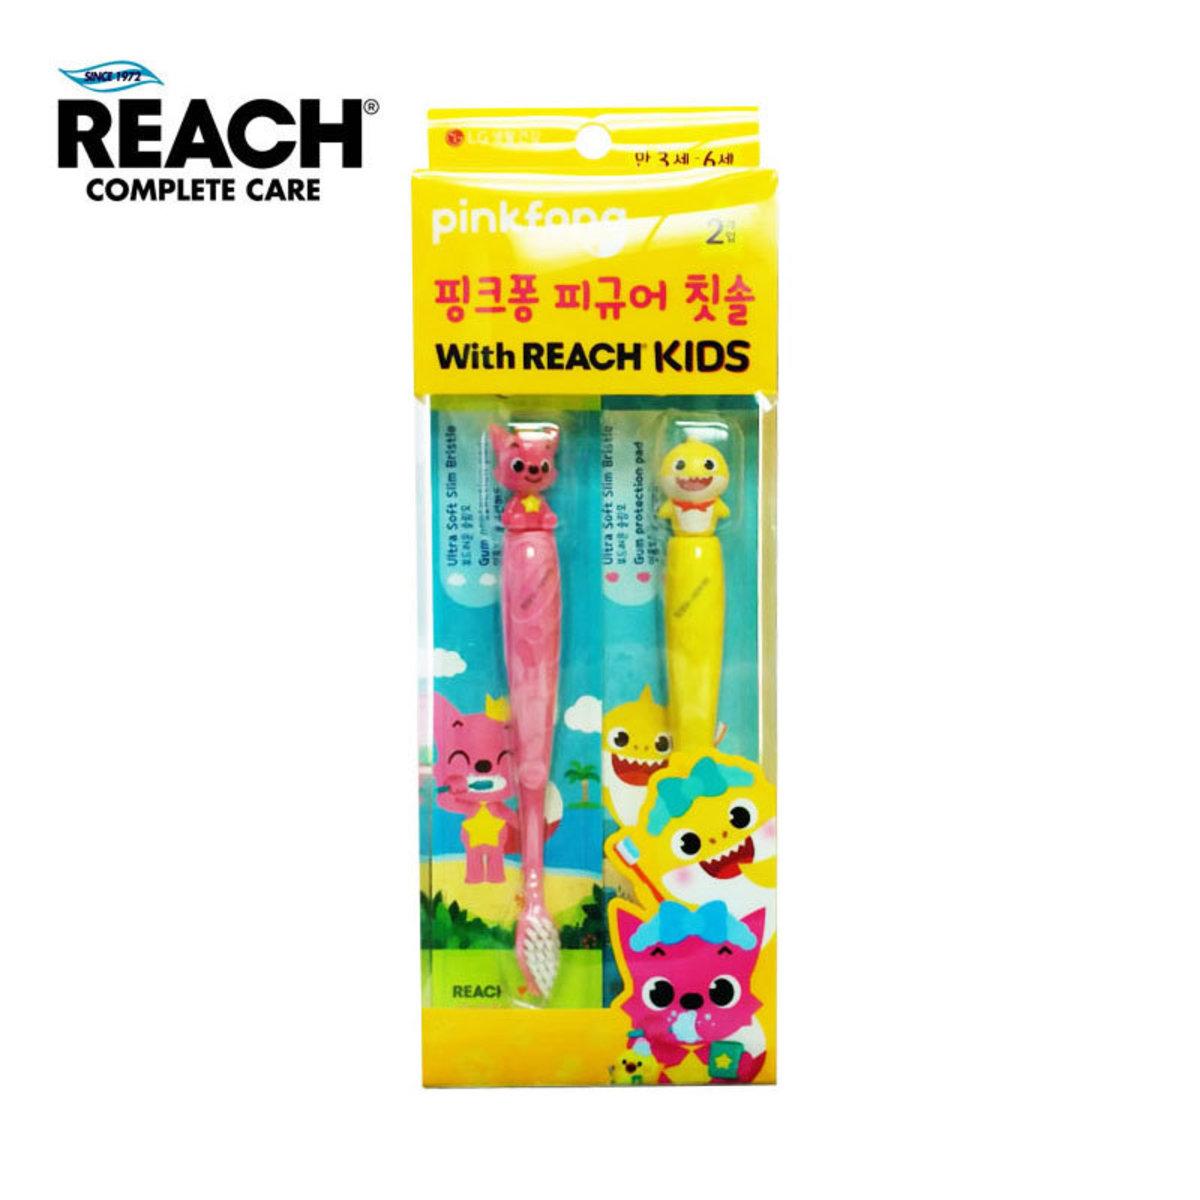 PINKFONG 3D Twin-set toothbrush